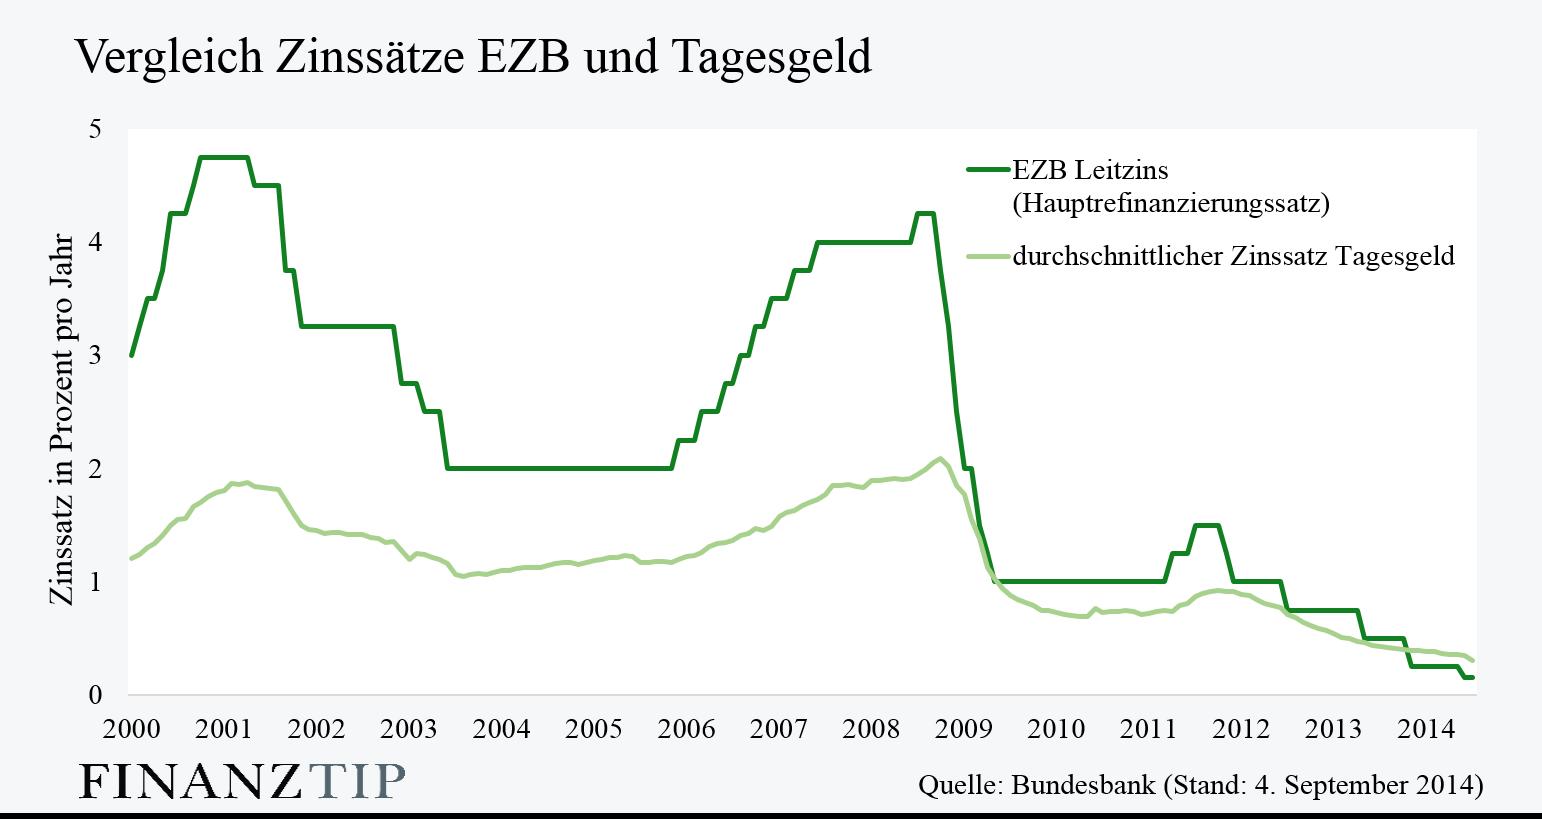 zins cc bank: